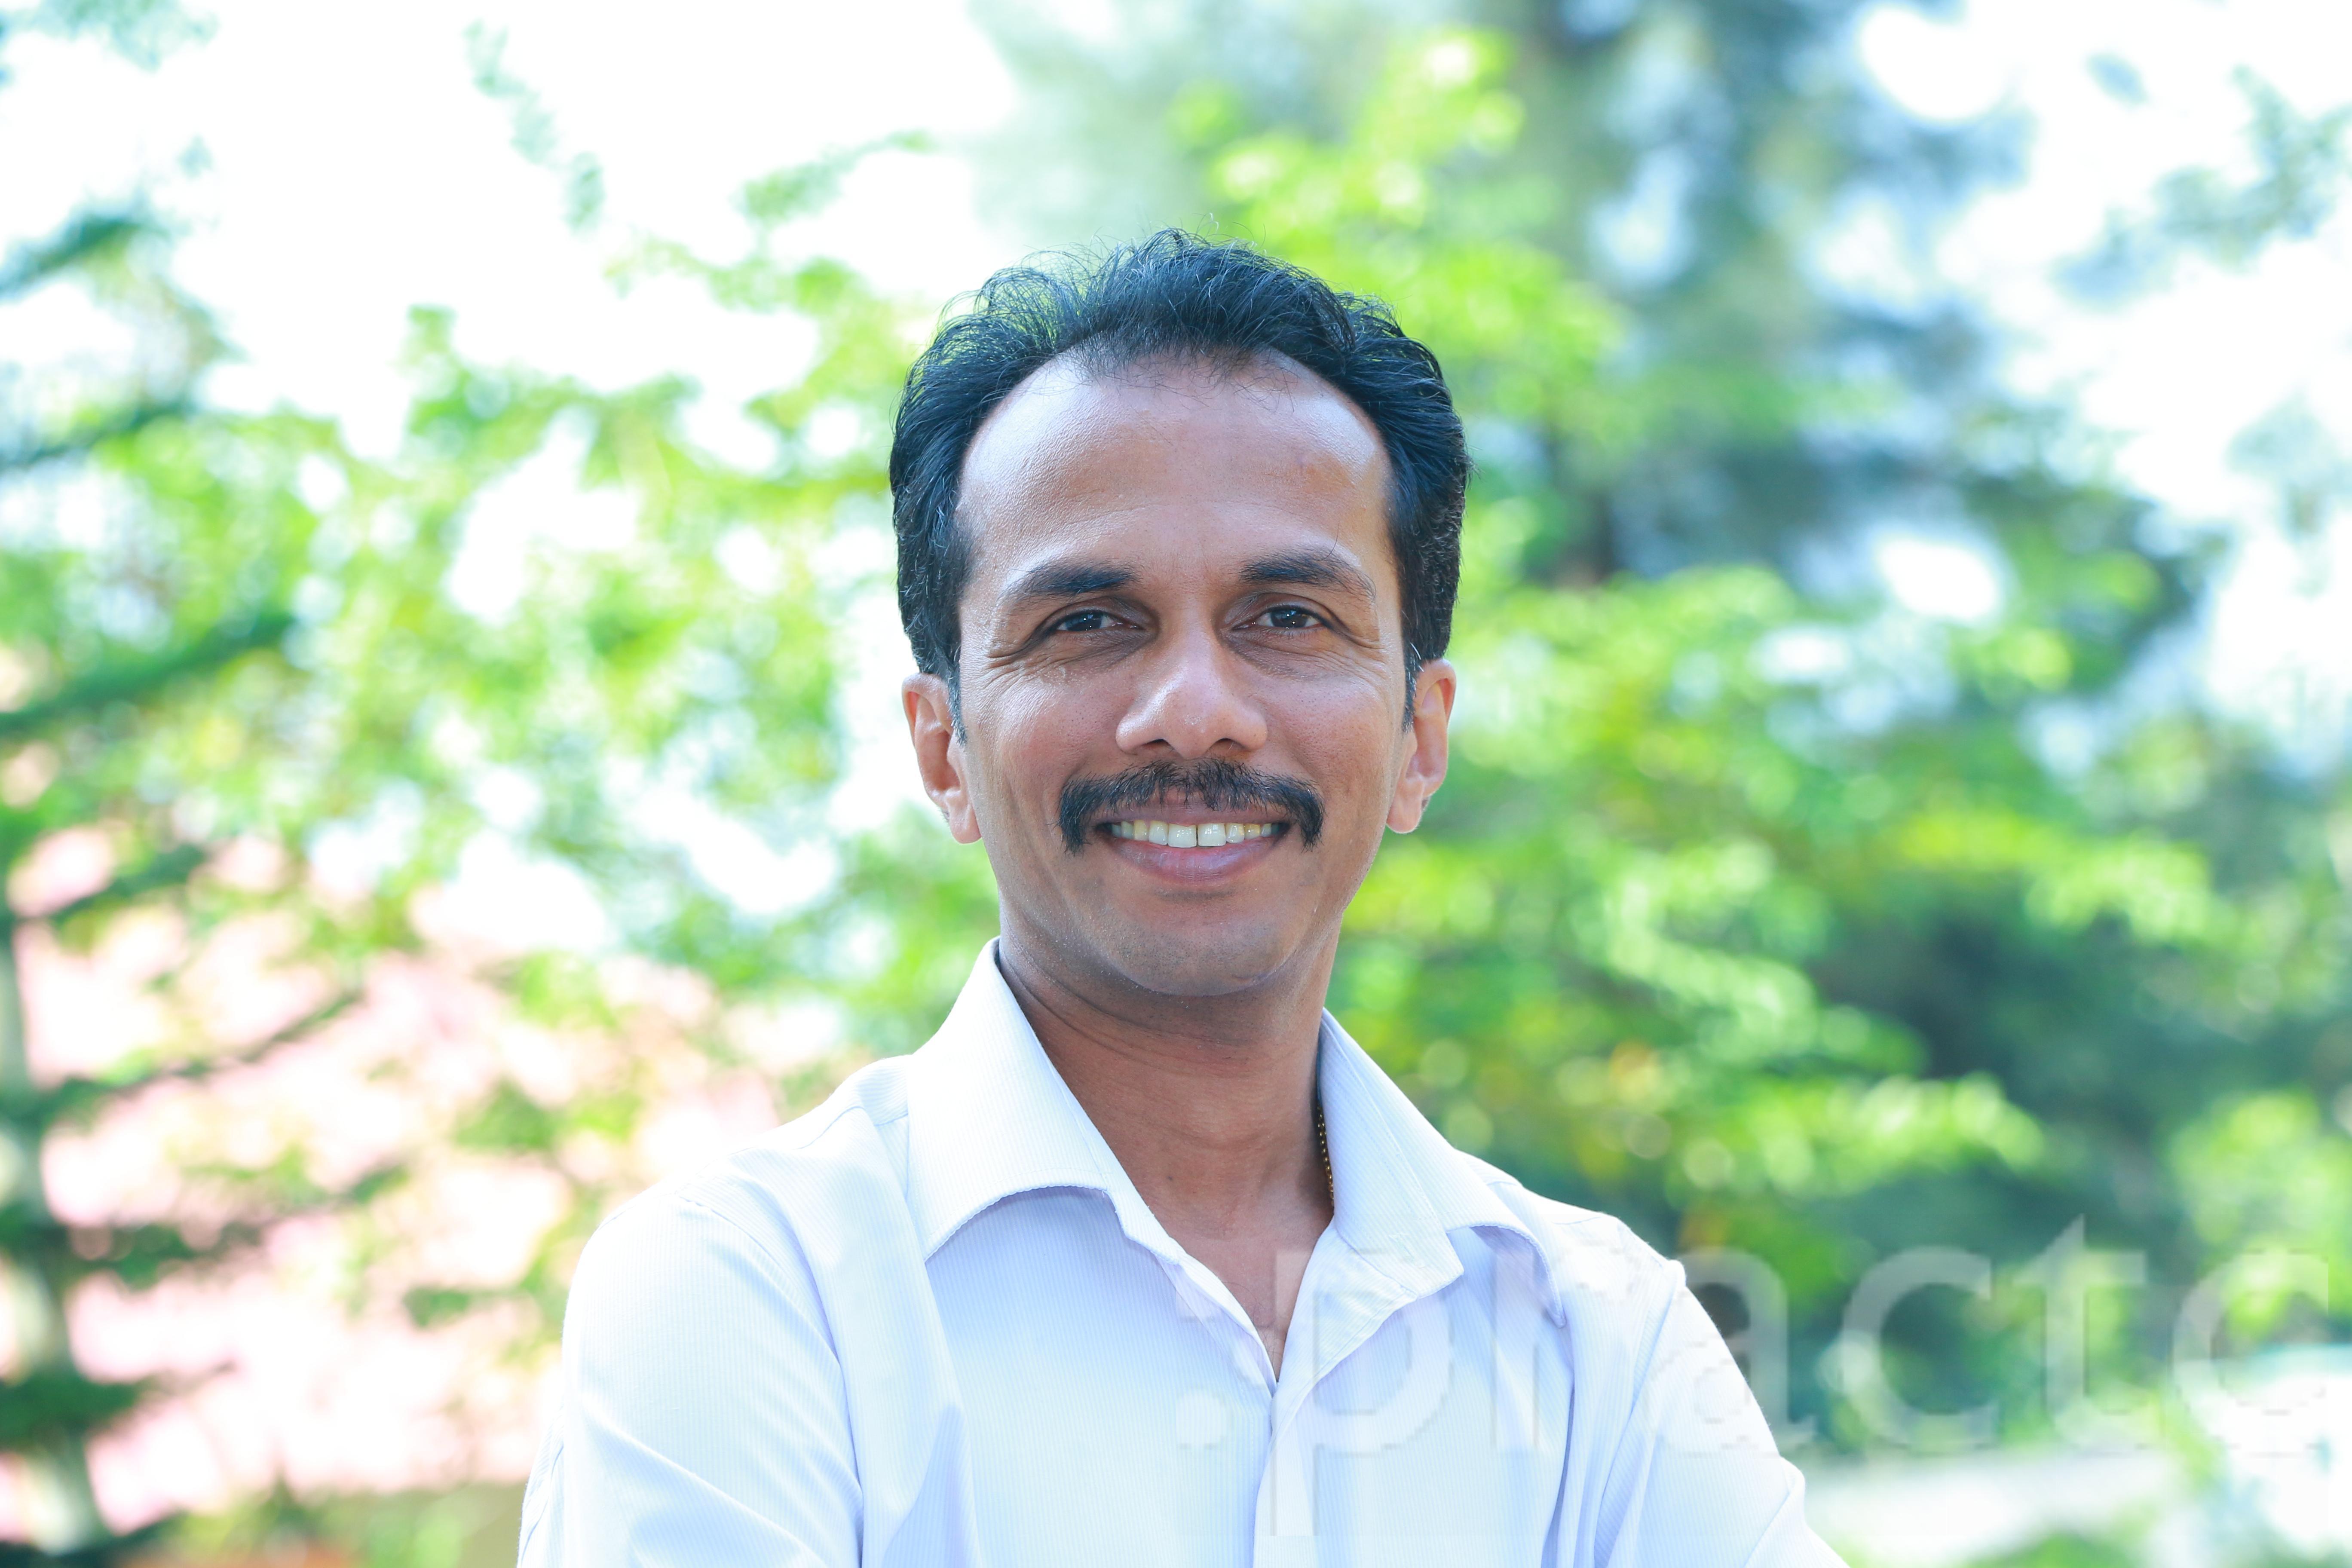 Dr. Vinodkumar - Dentist